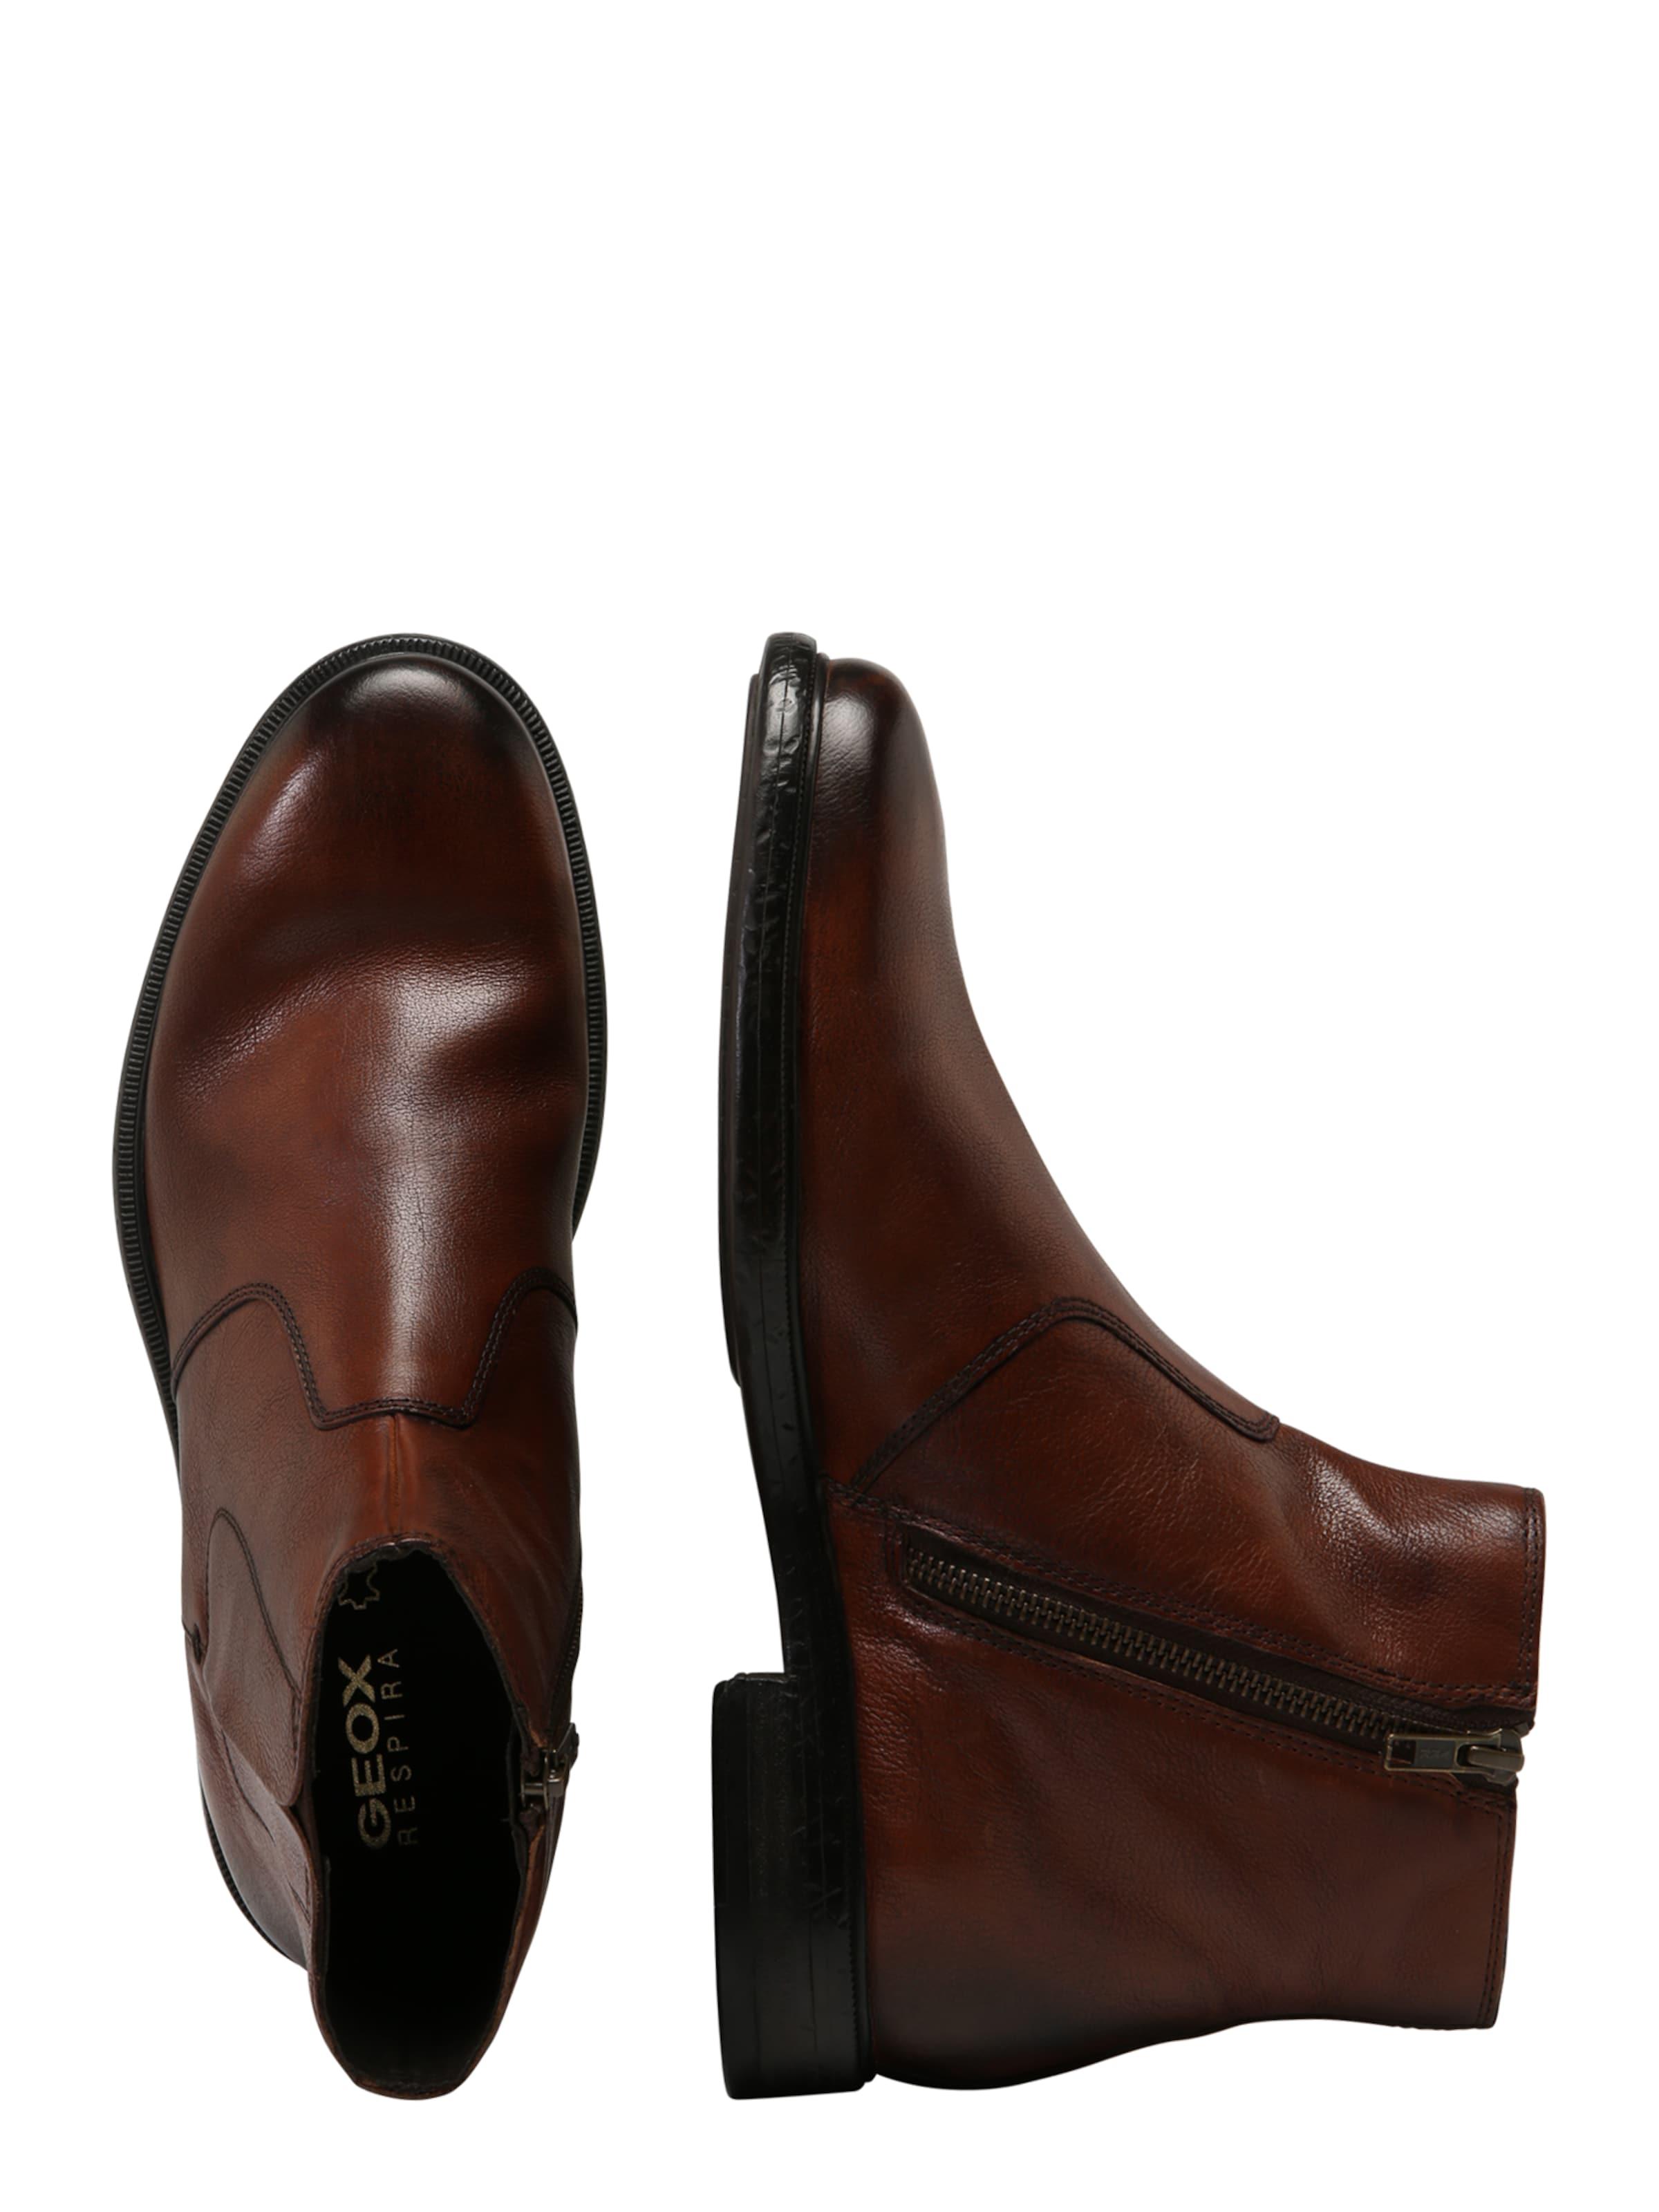 Boots Geox Chelsea Marron Châtaigne 'terence' En 2EH9IbWDeY